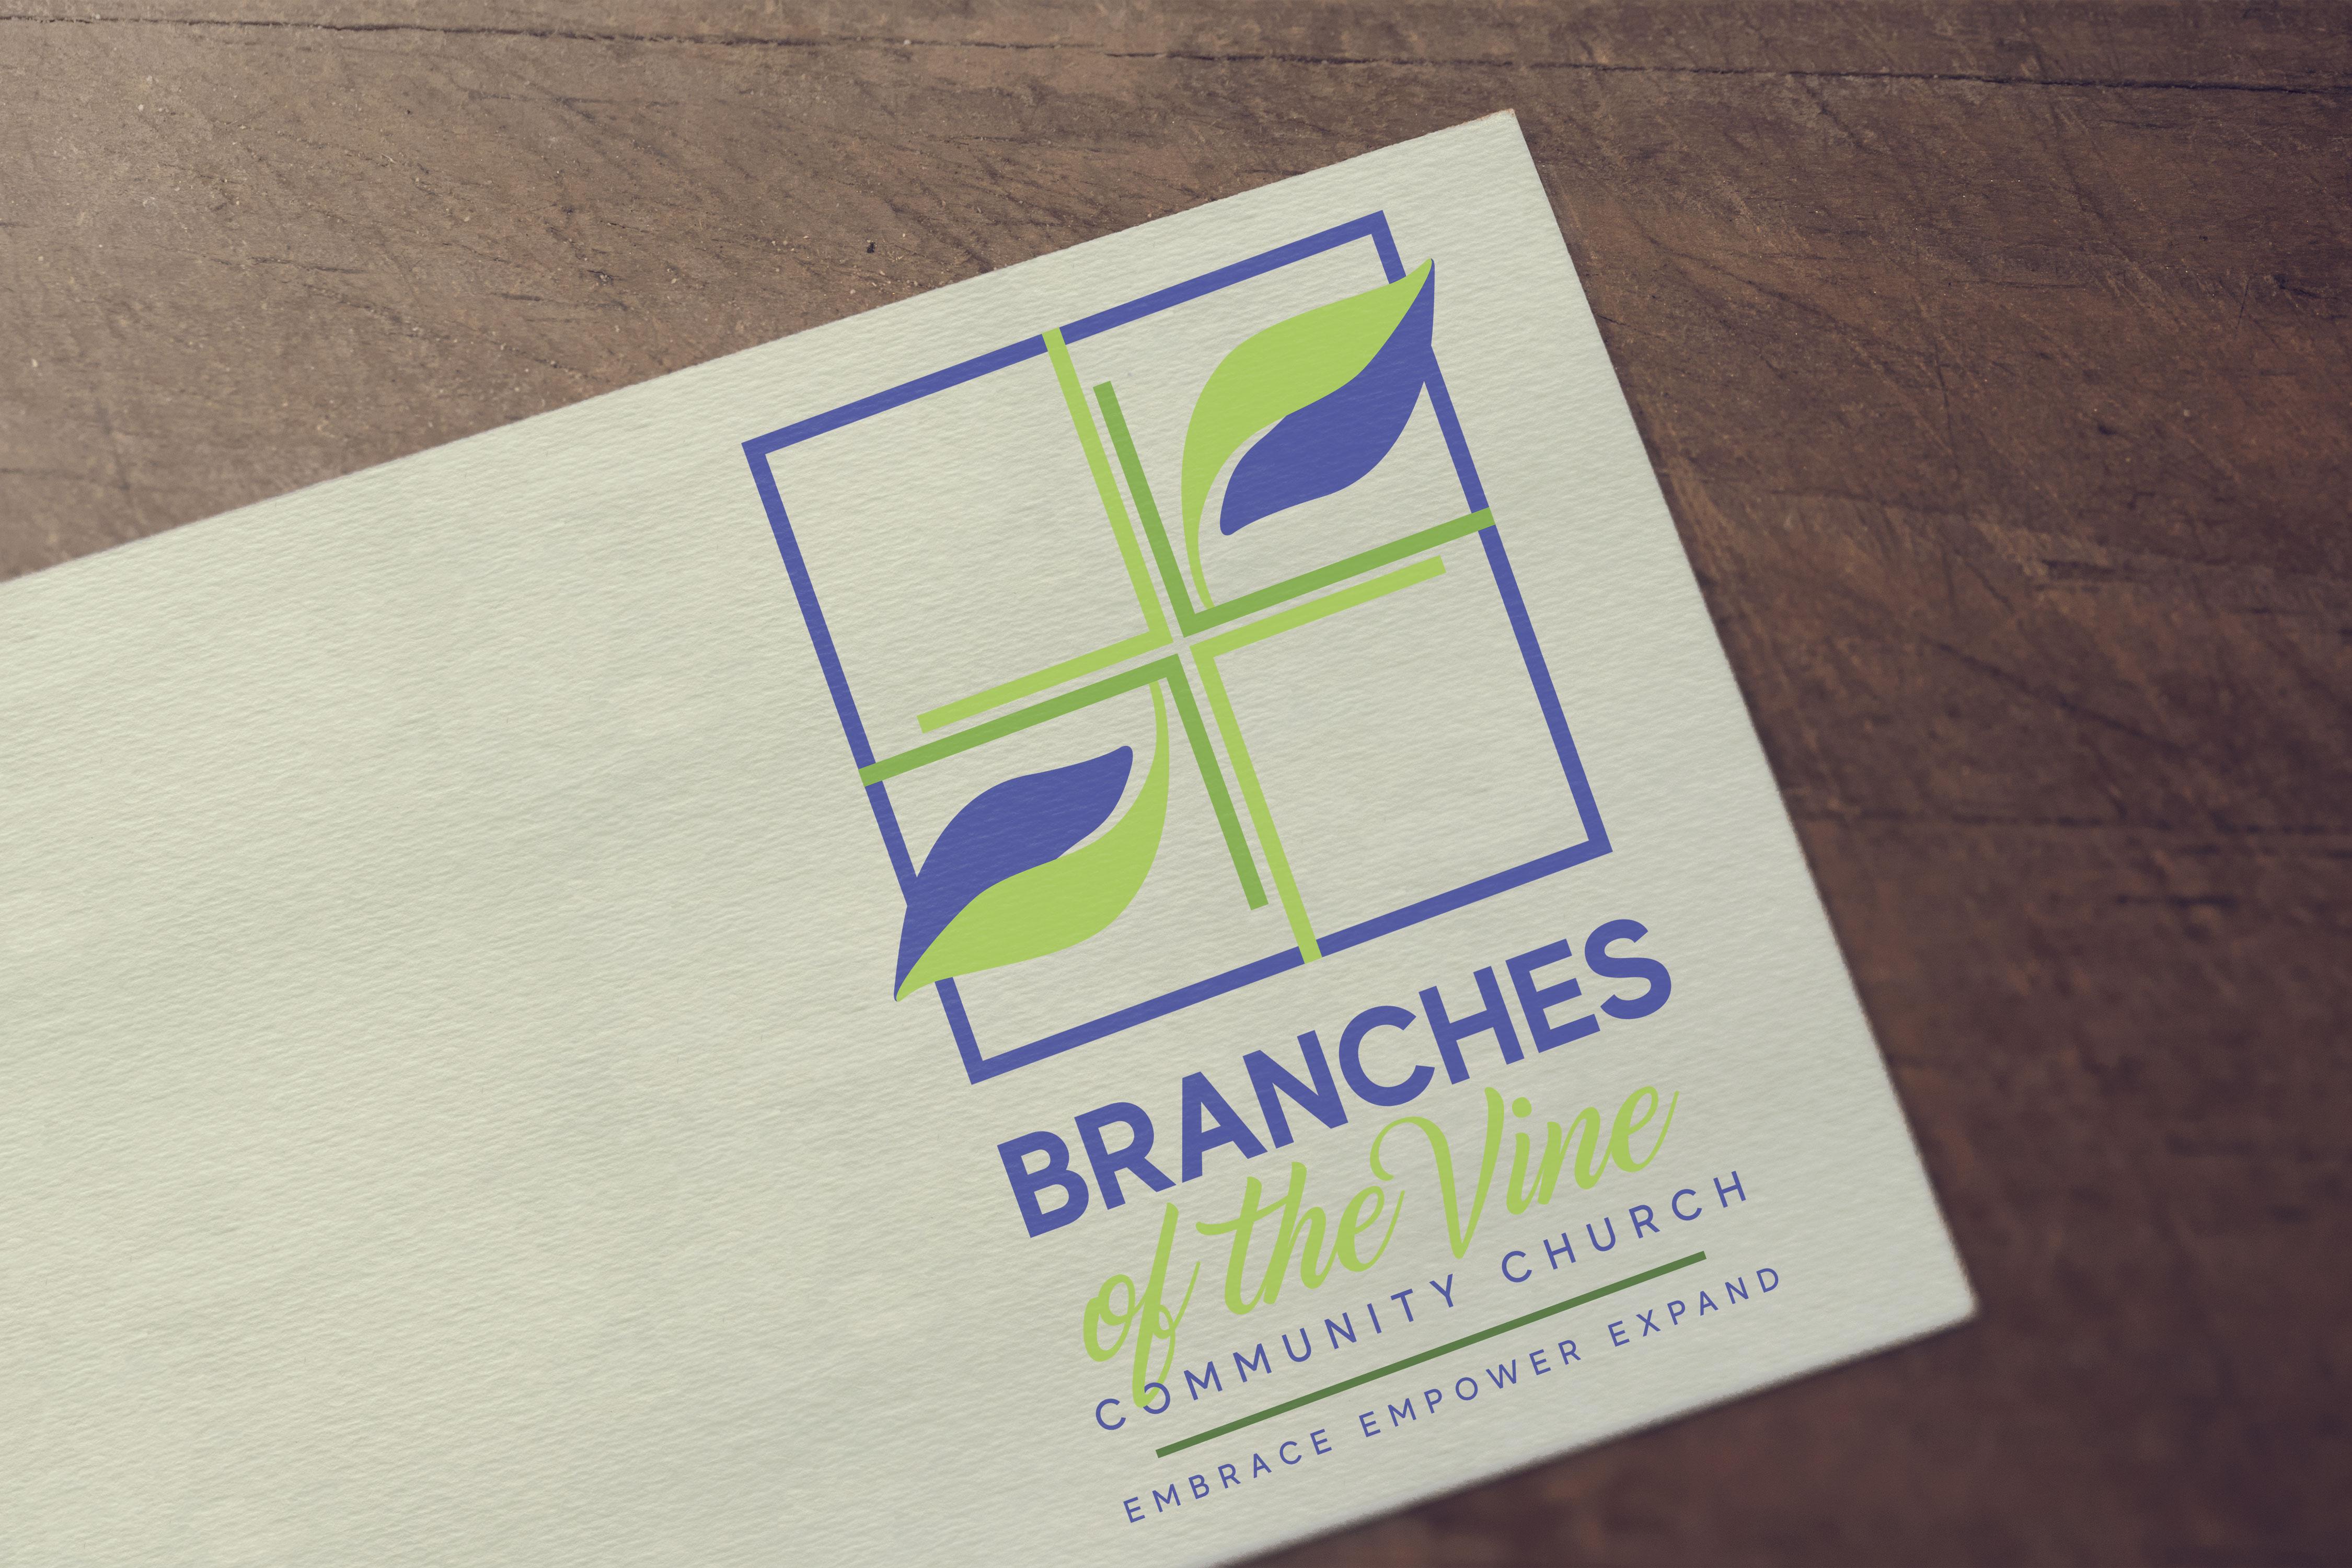 BranchesOfTheVine-Logo